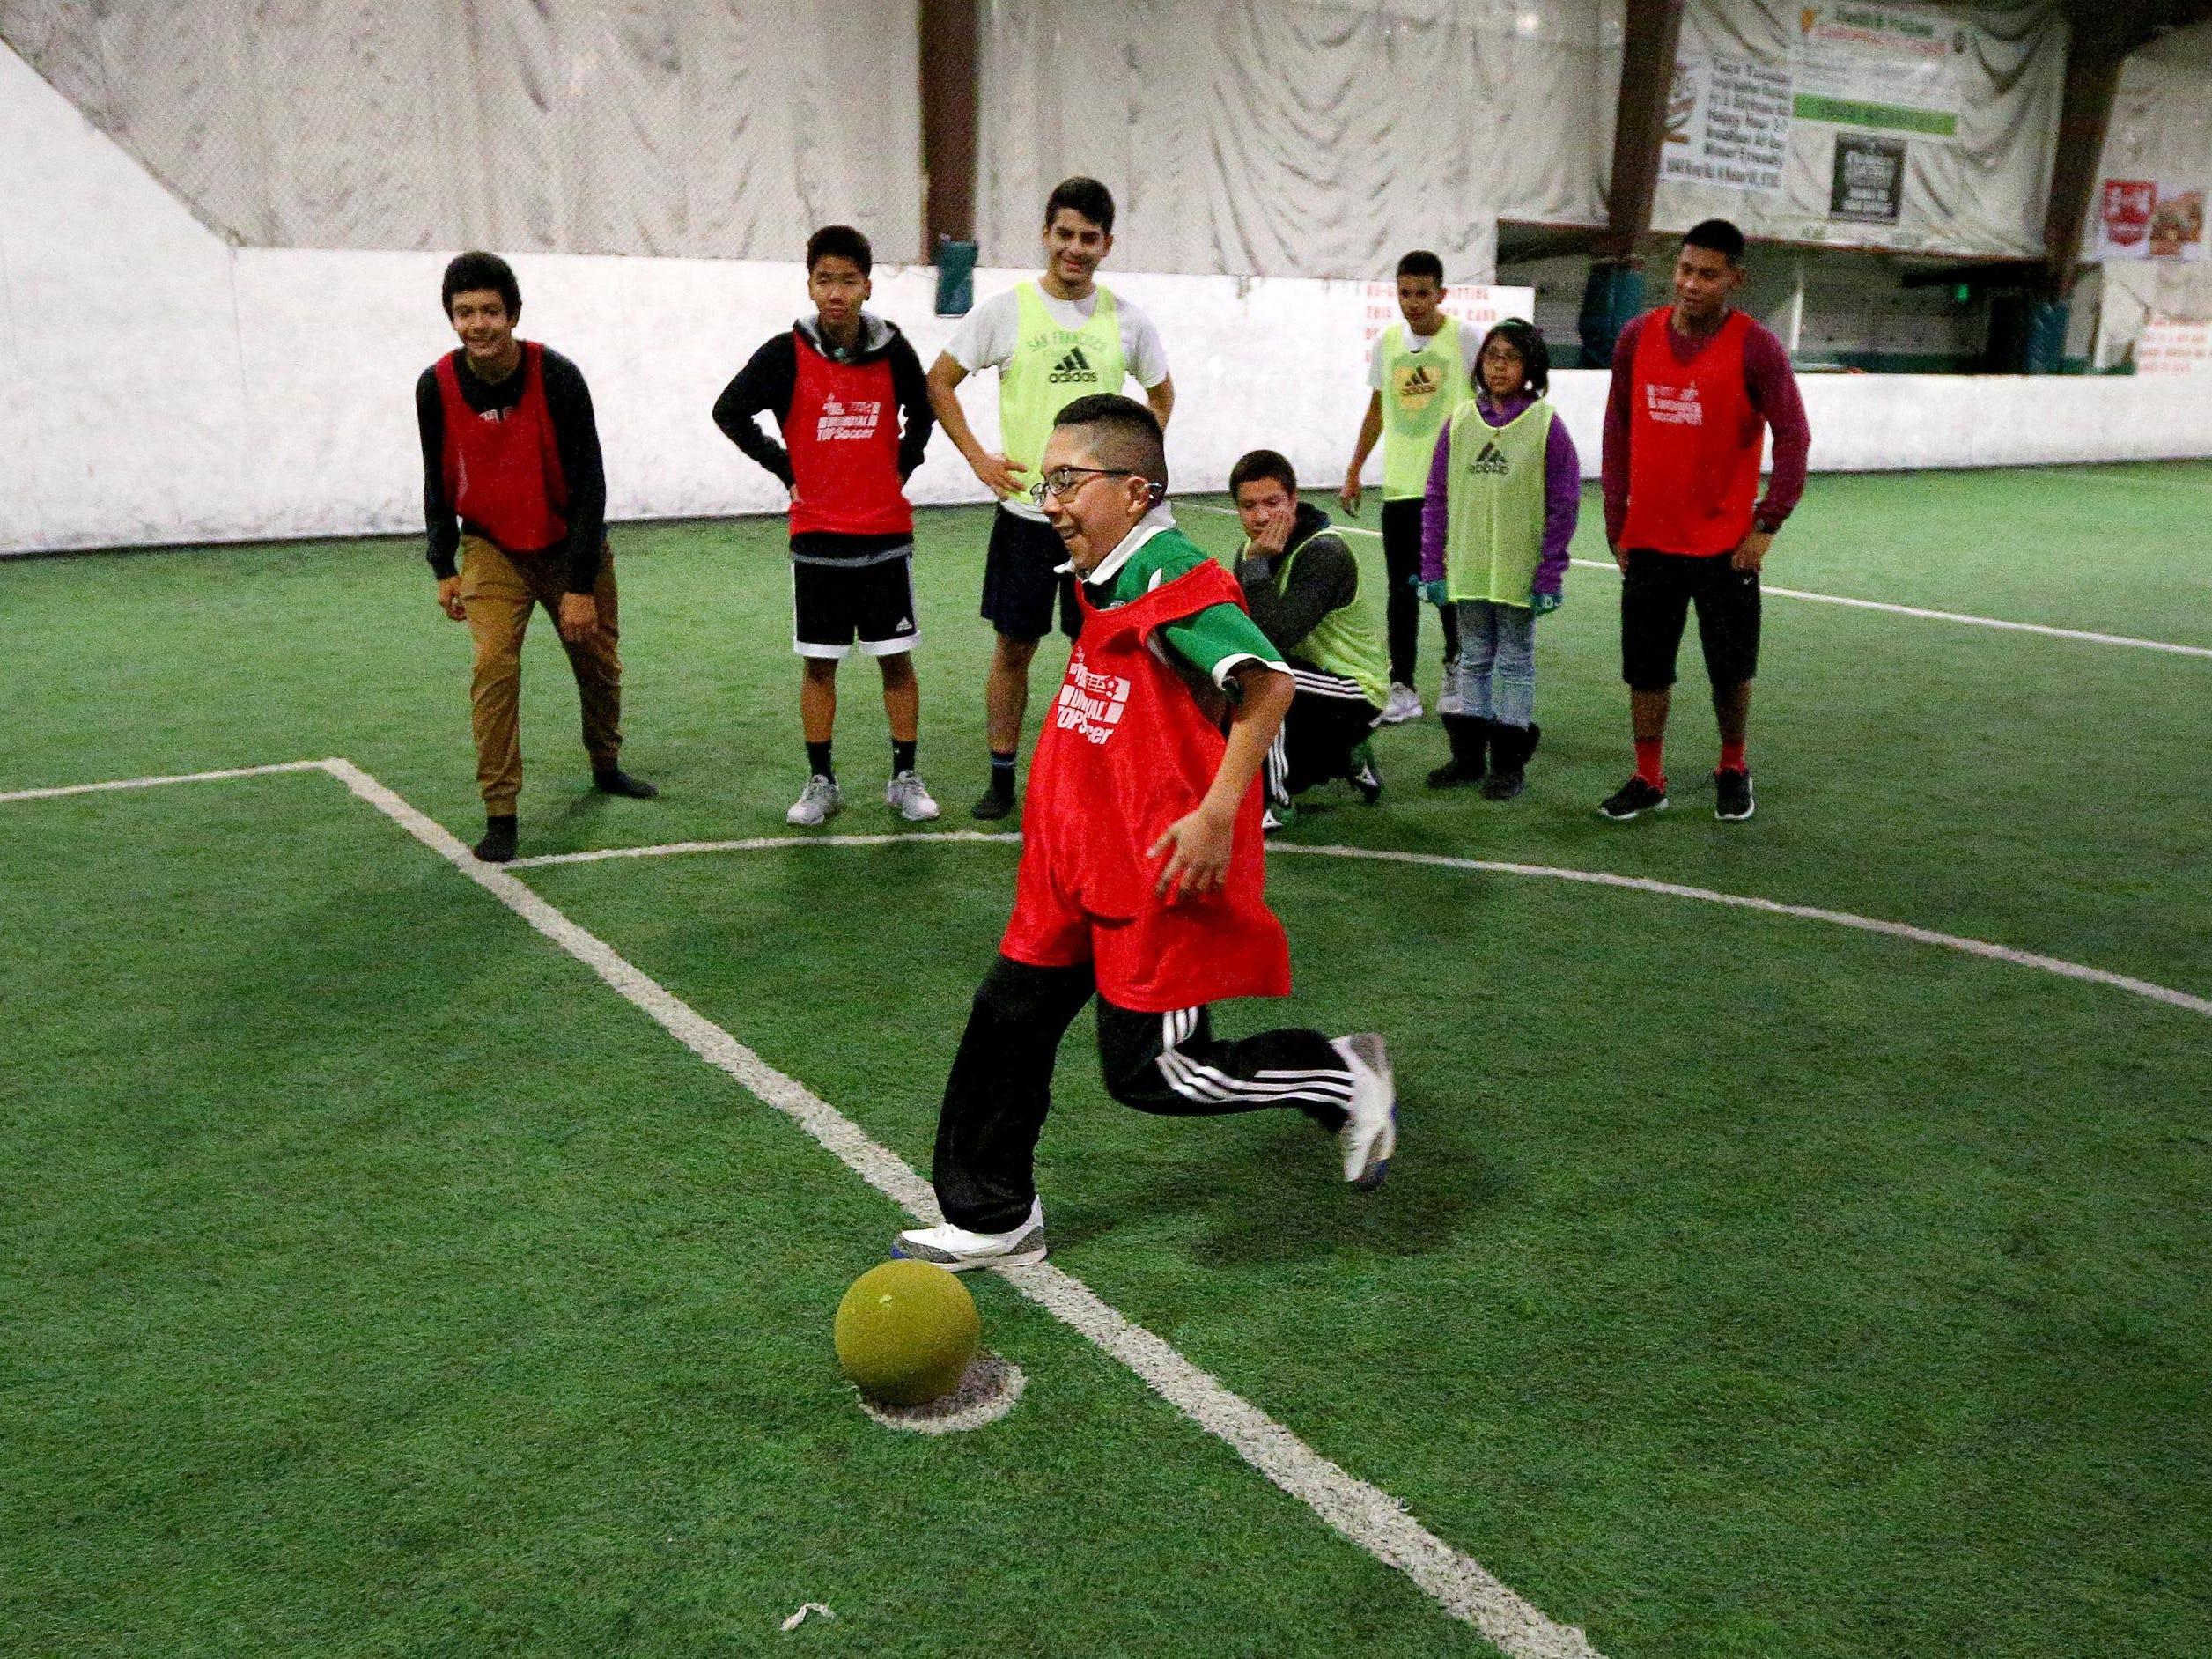 Corazon Barocio scores a goal on a penalty kick during a soccer program with North Salem High School's boys soccer.